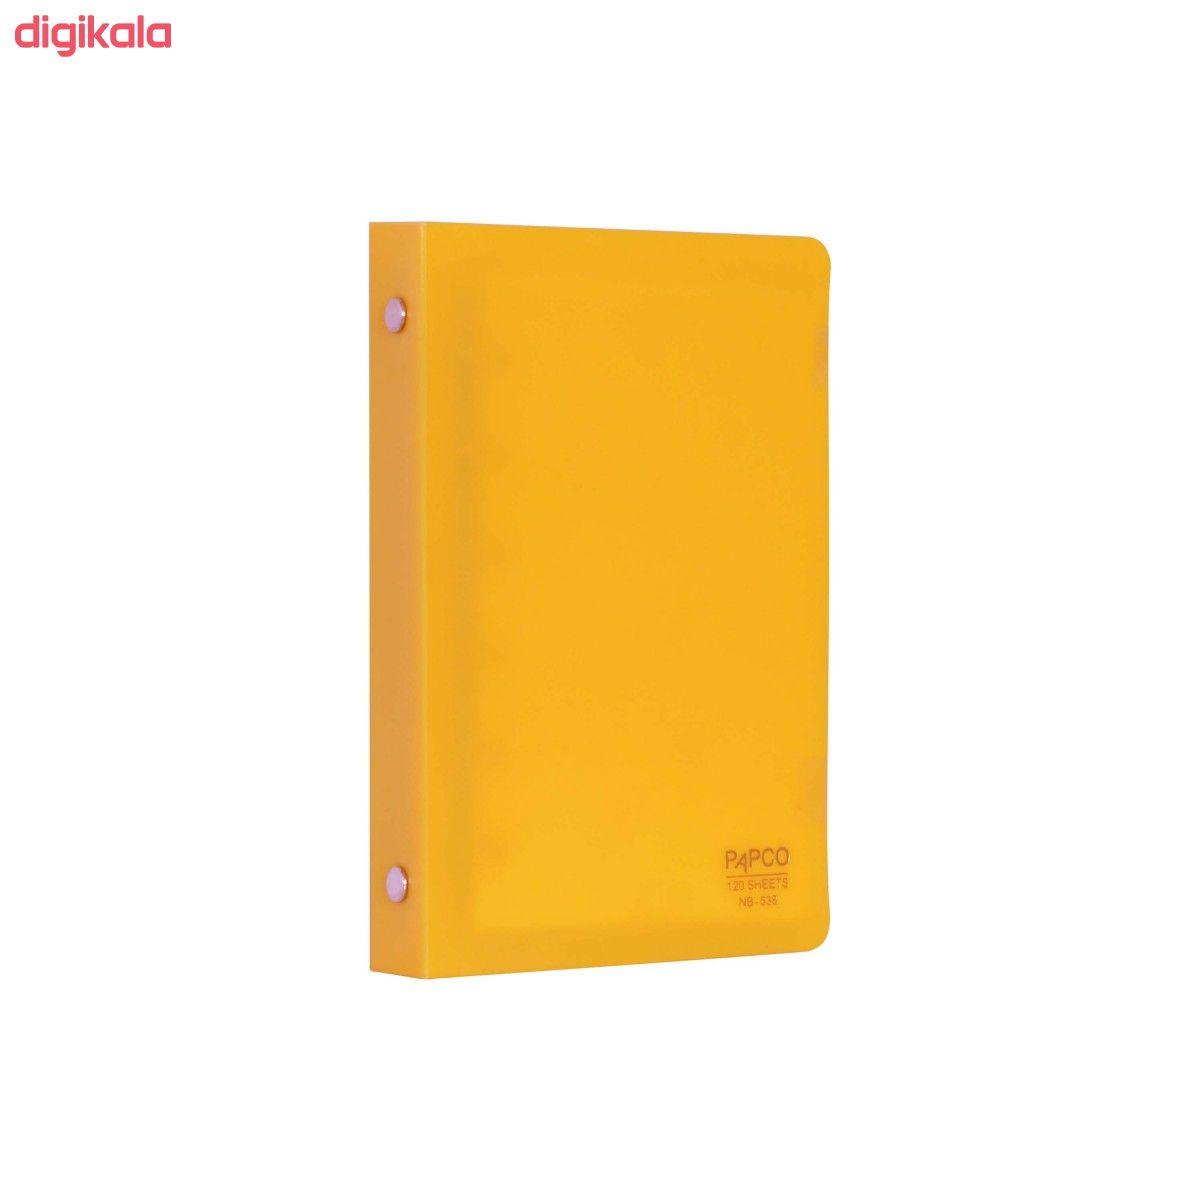 دفتر یادداشت 120 برگ پاپکو مدل  NB-638 کد HT01 main 1 15